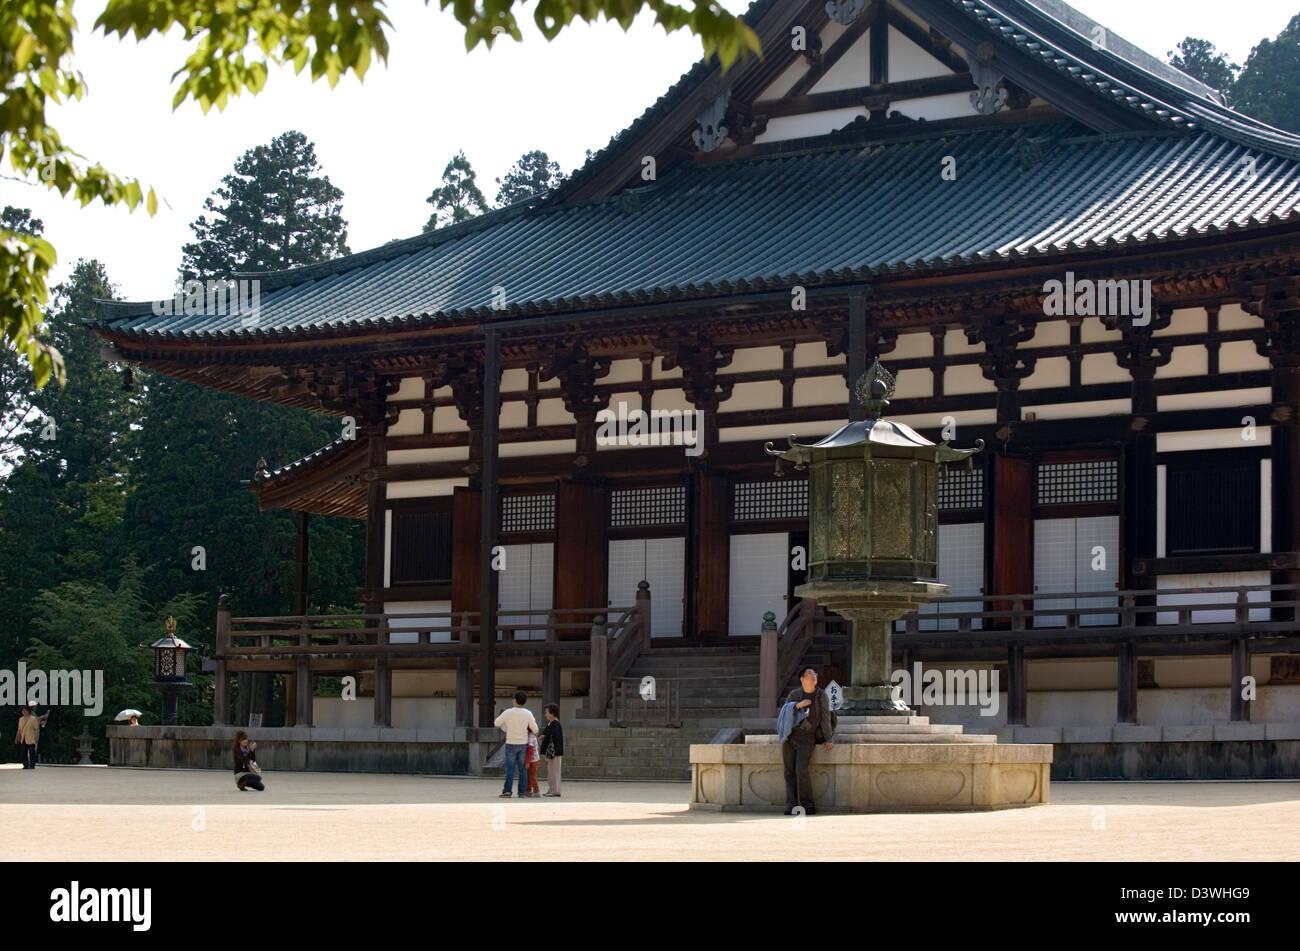 Visitors at the Kondo Main Hall at Danjo Garan in Kongobuji Temple complex on Koyasan, or Mount Koya, Wakayama, - Stock Image